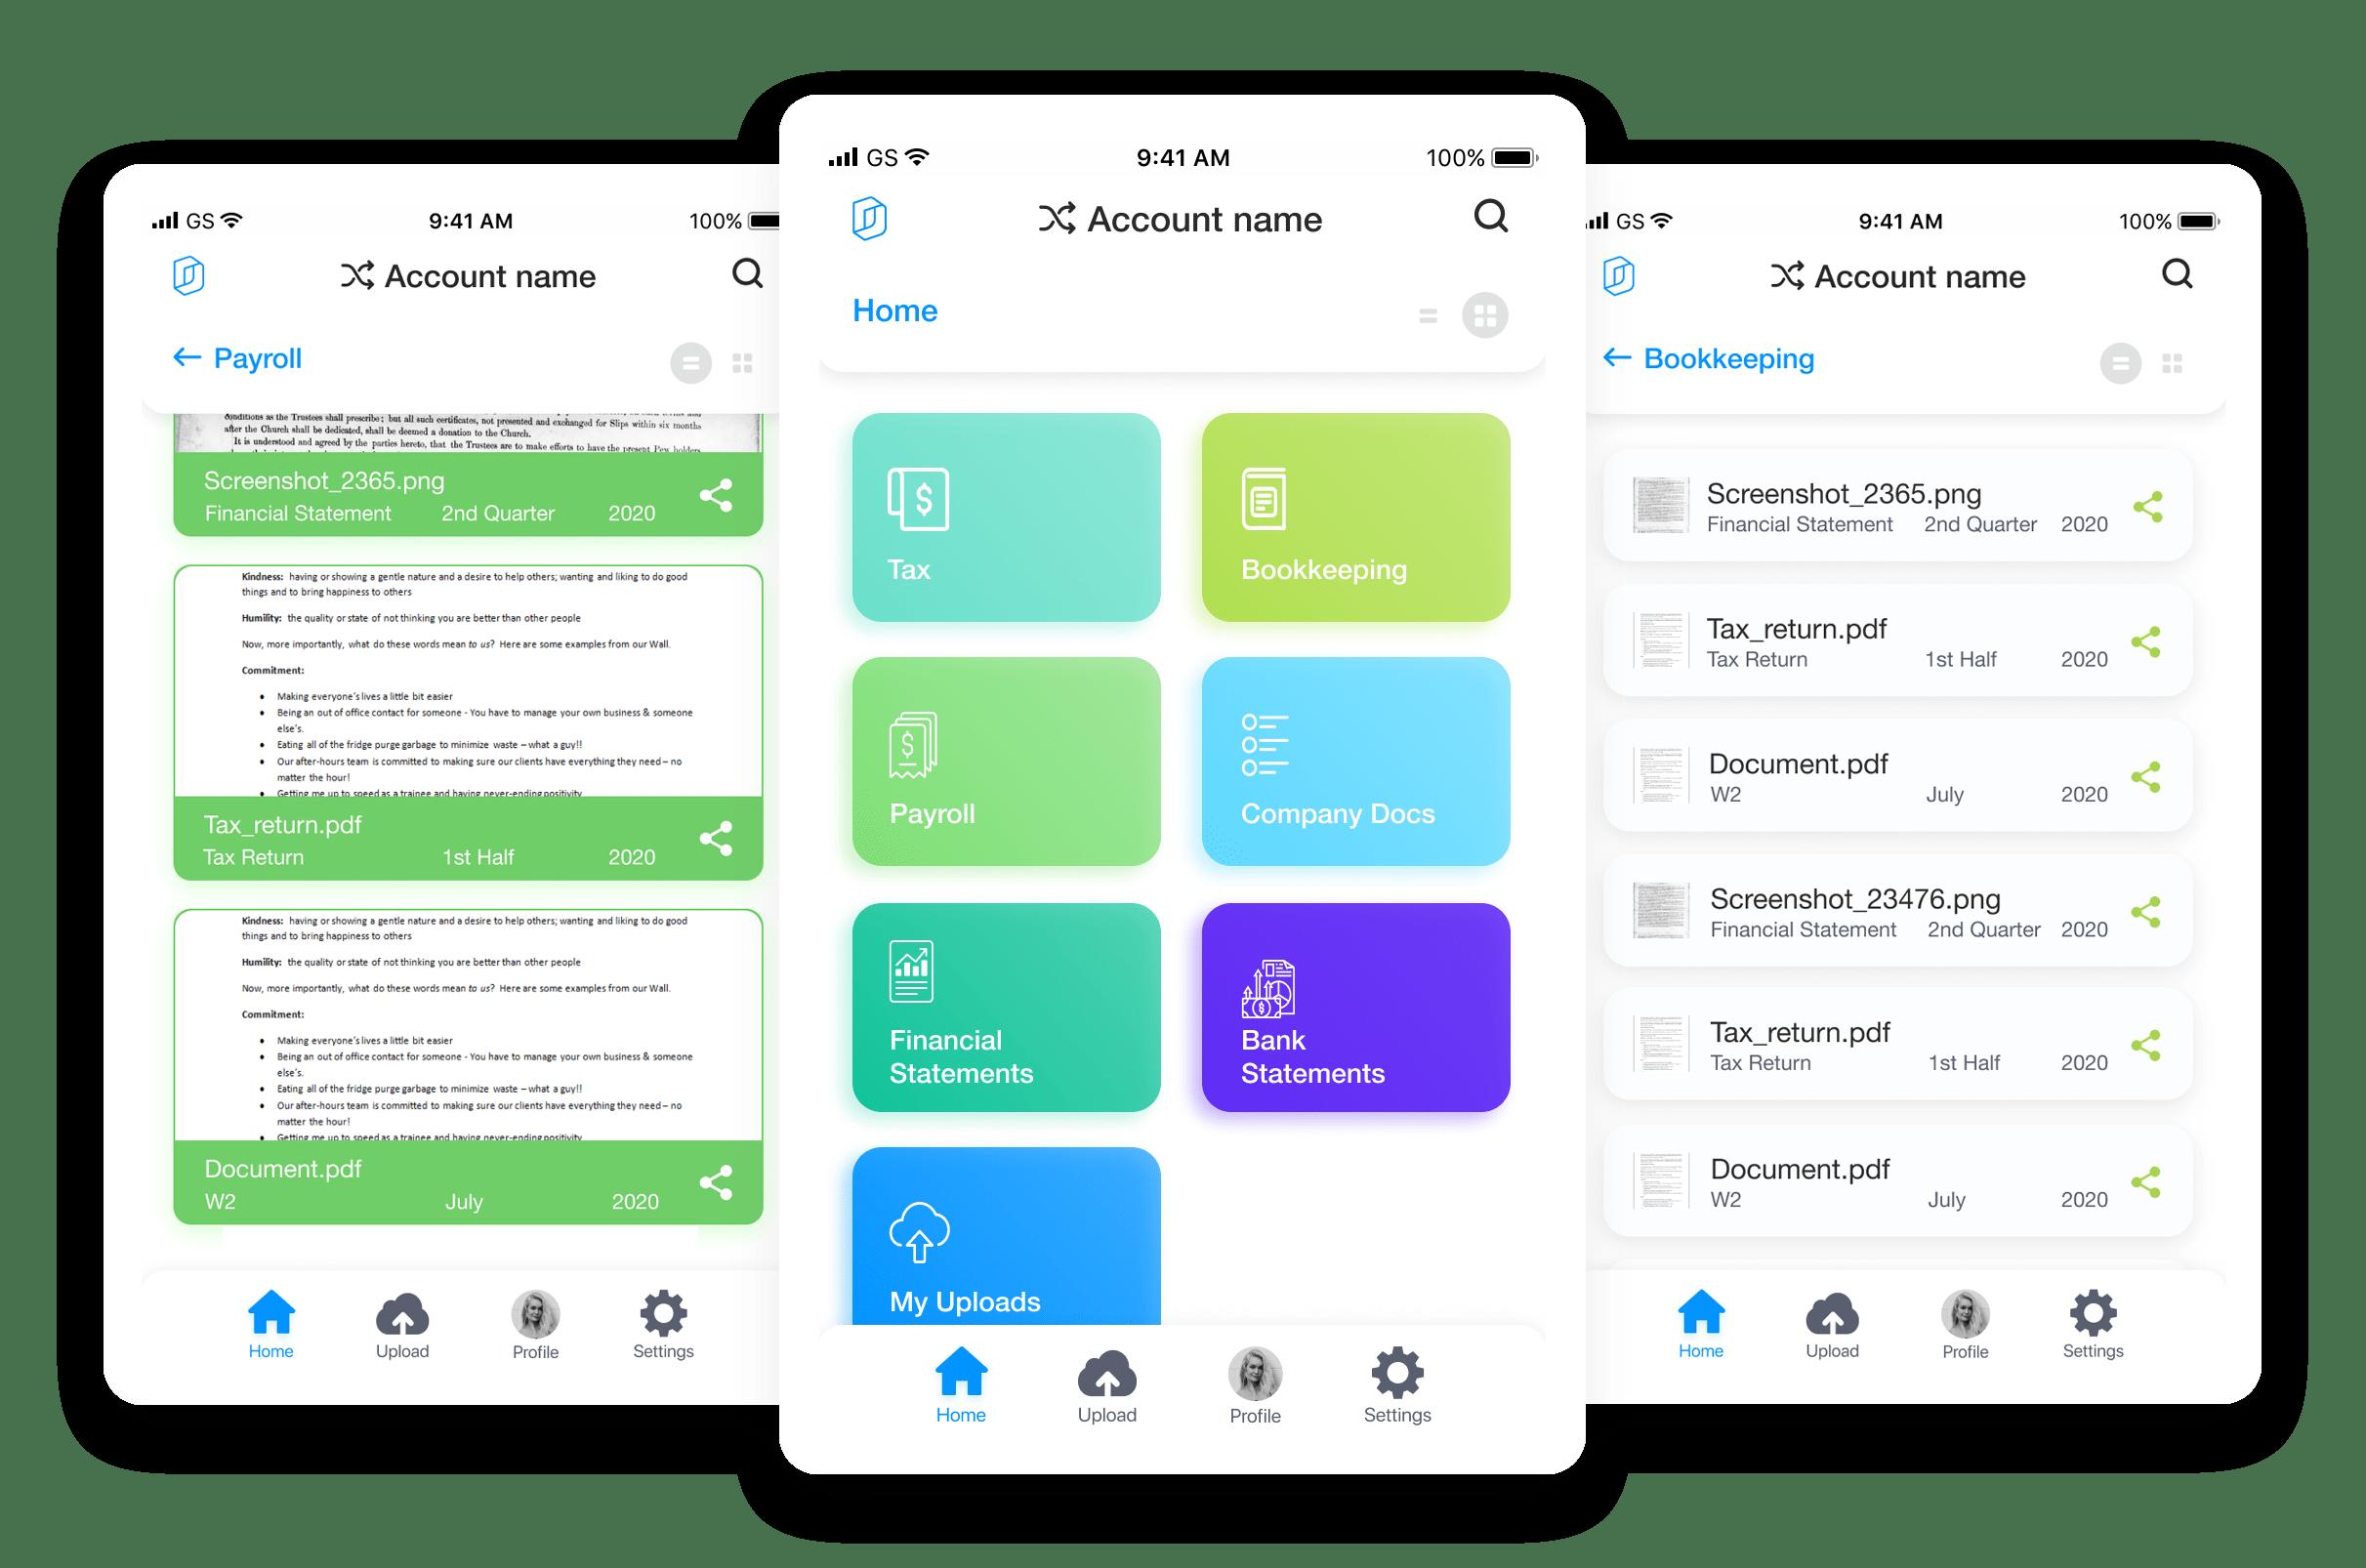 app-screen